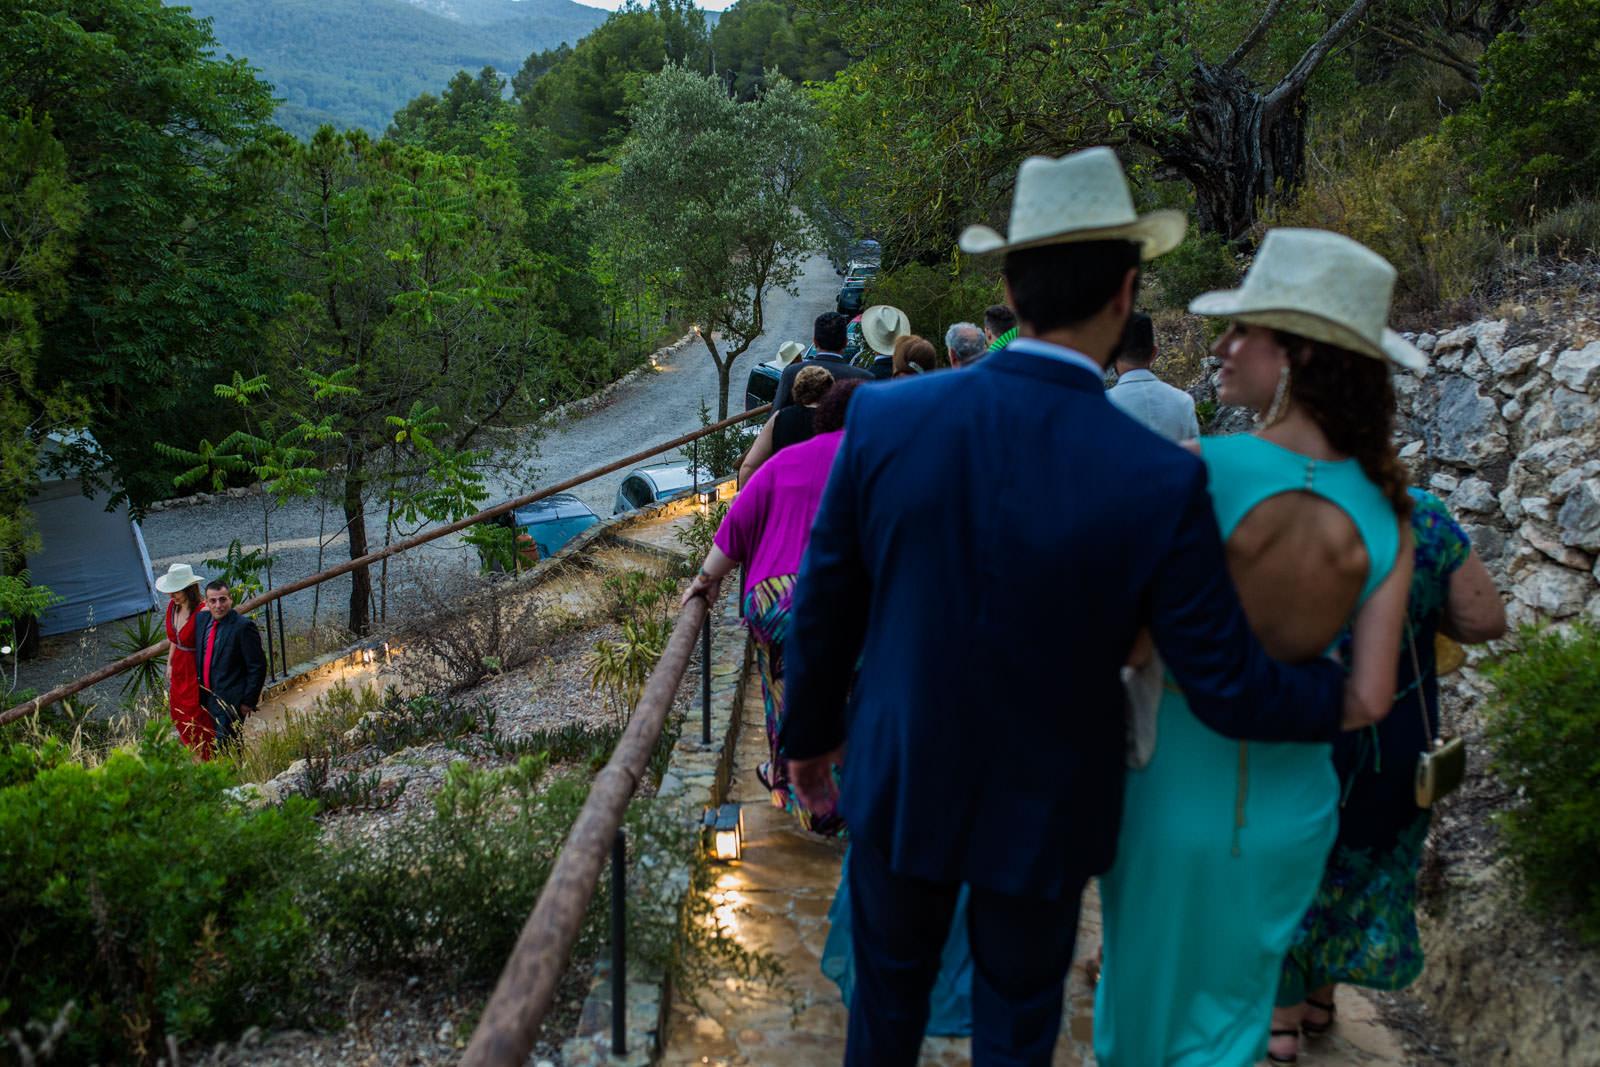 Almirall-Font-sitges-marbella-engagement-Rafael-Torres-fotografo-bodas-sevilla-madrid-barcelona-wedding-photographer--54.jpg